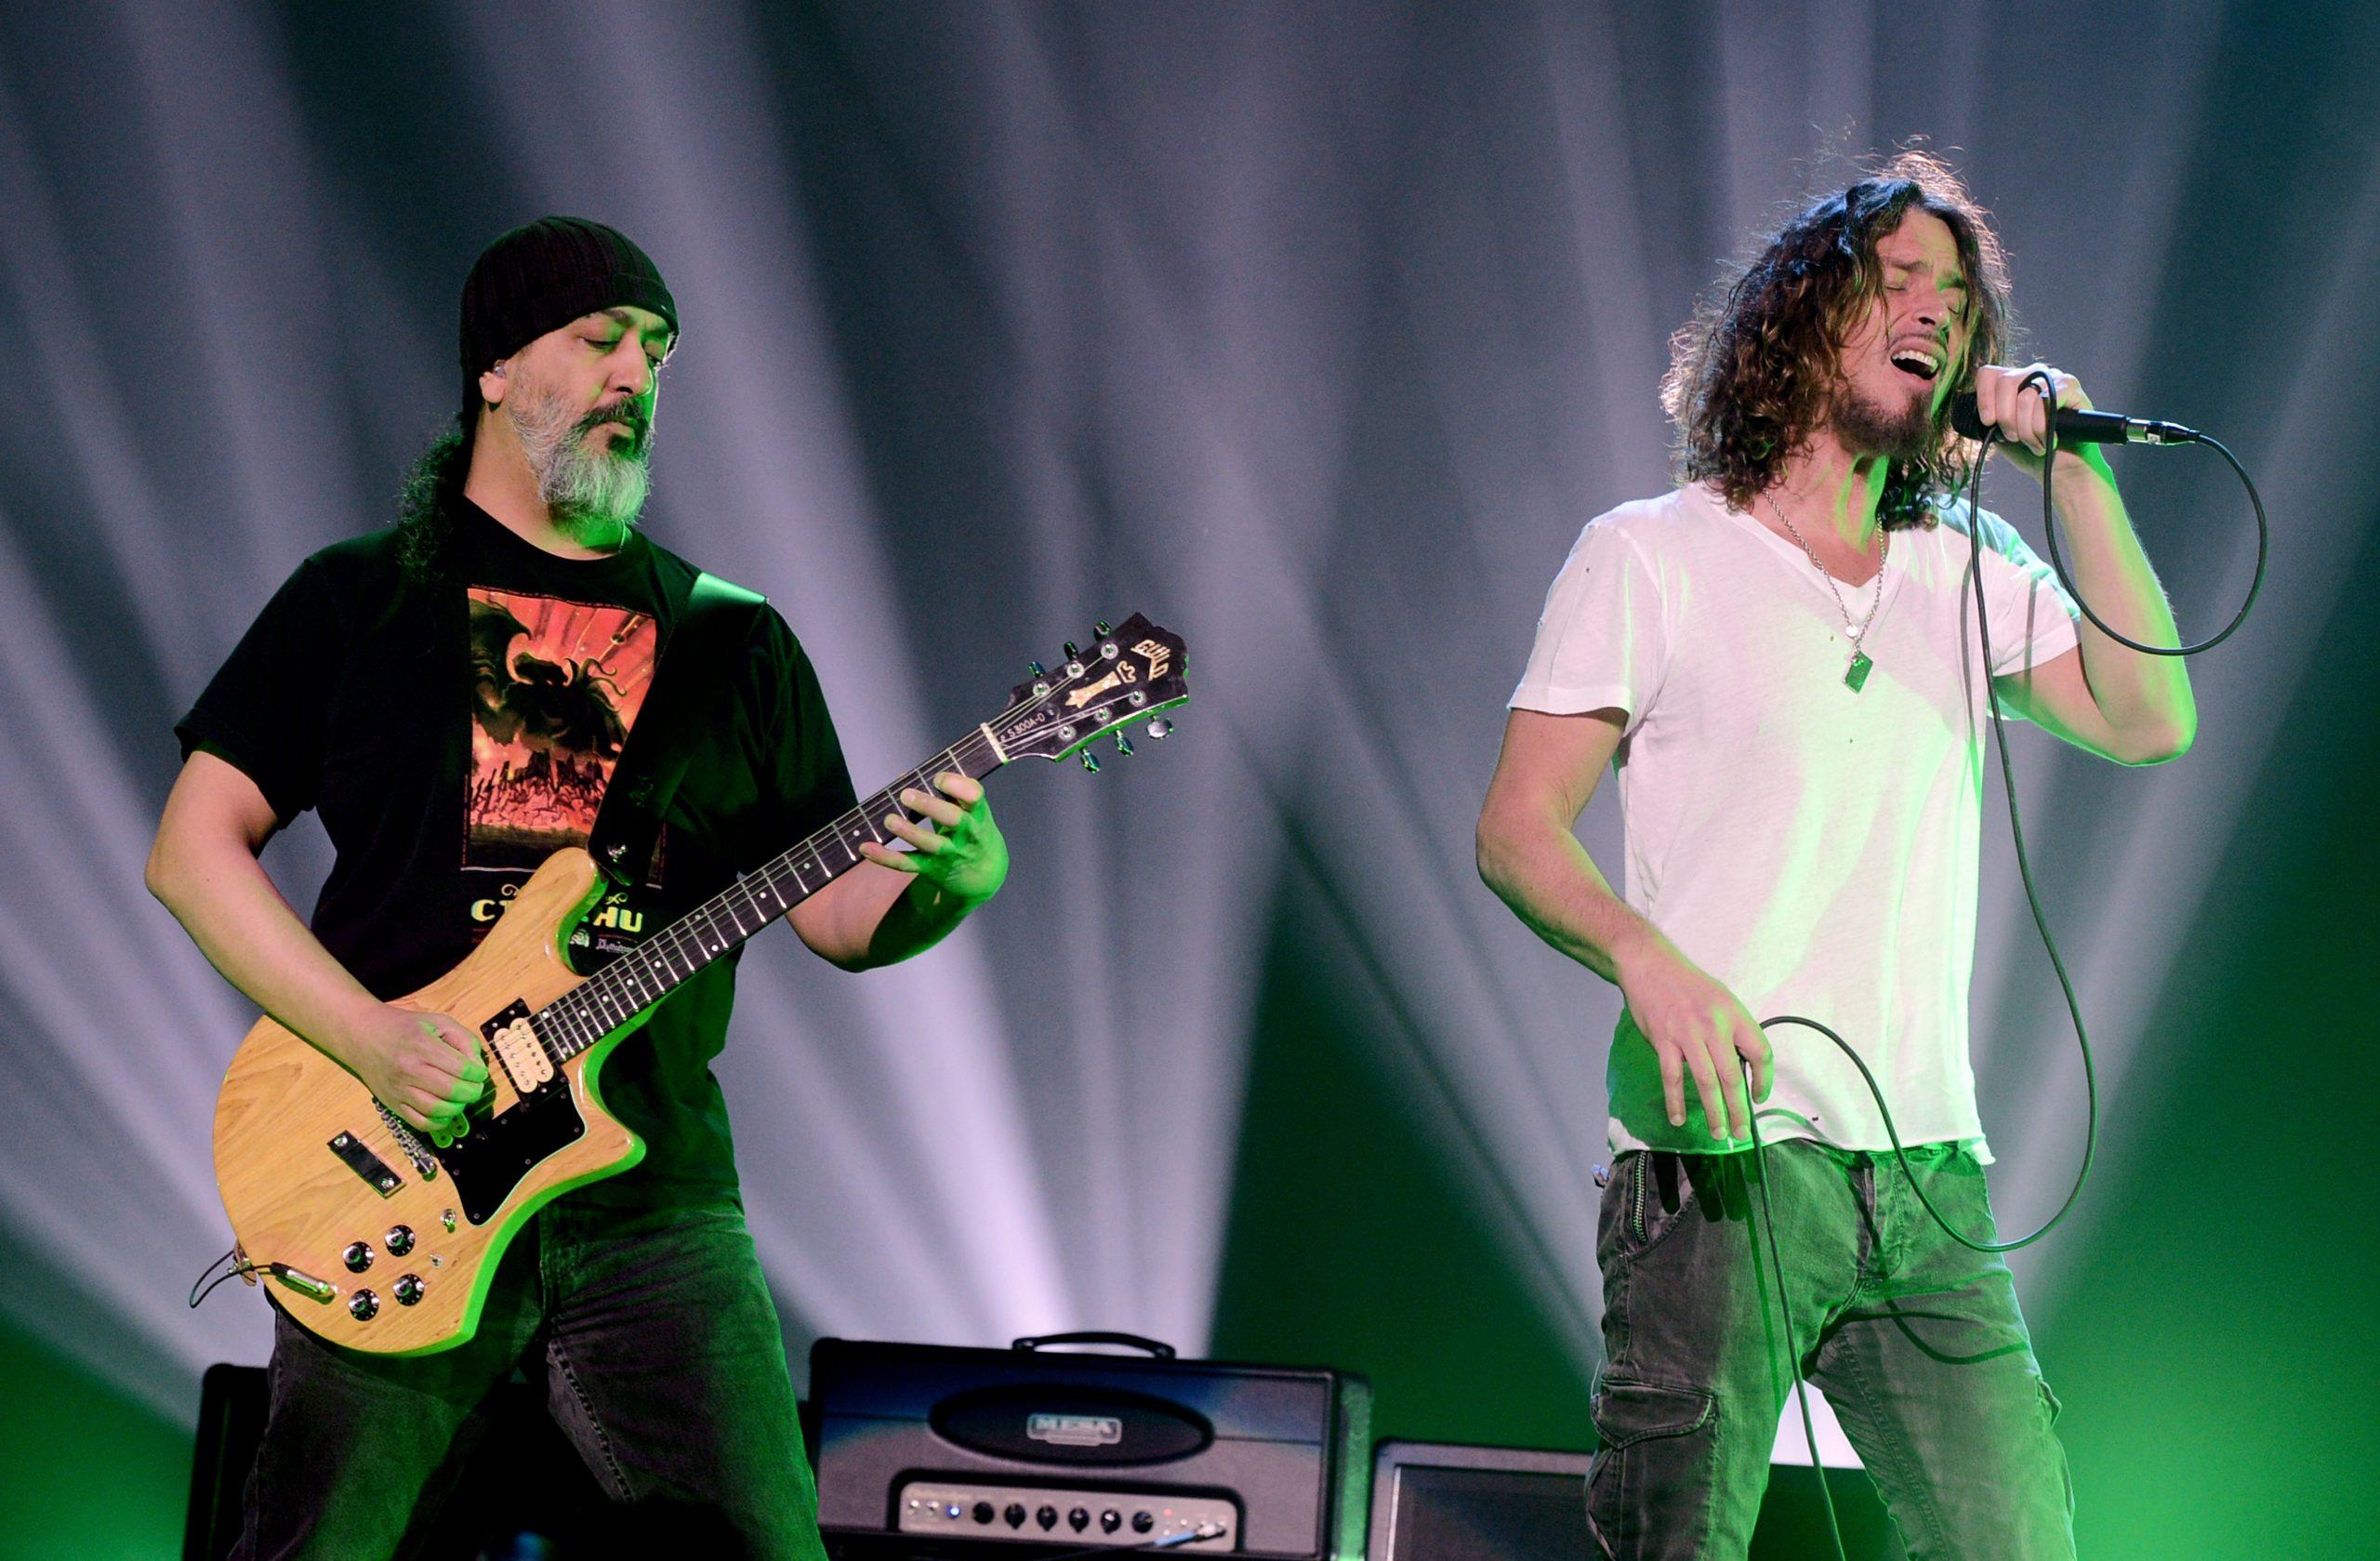 See Soundgarden's journey through 13 legendary concerts